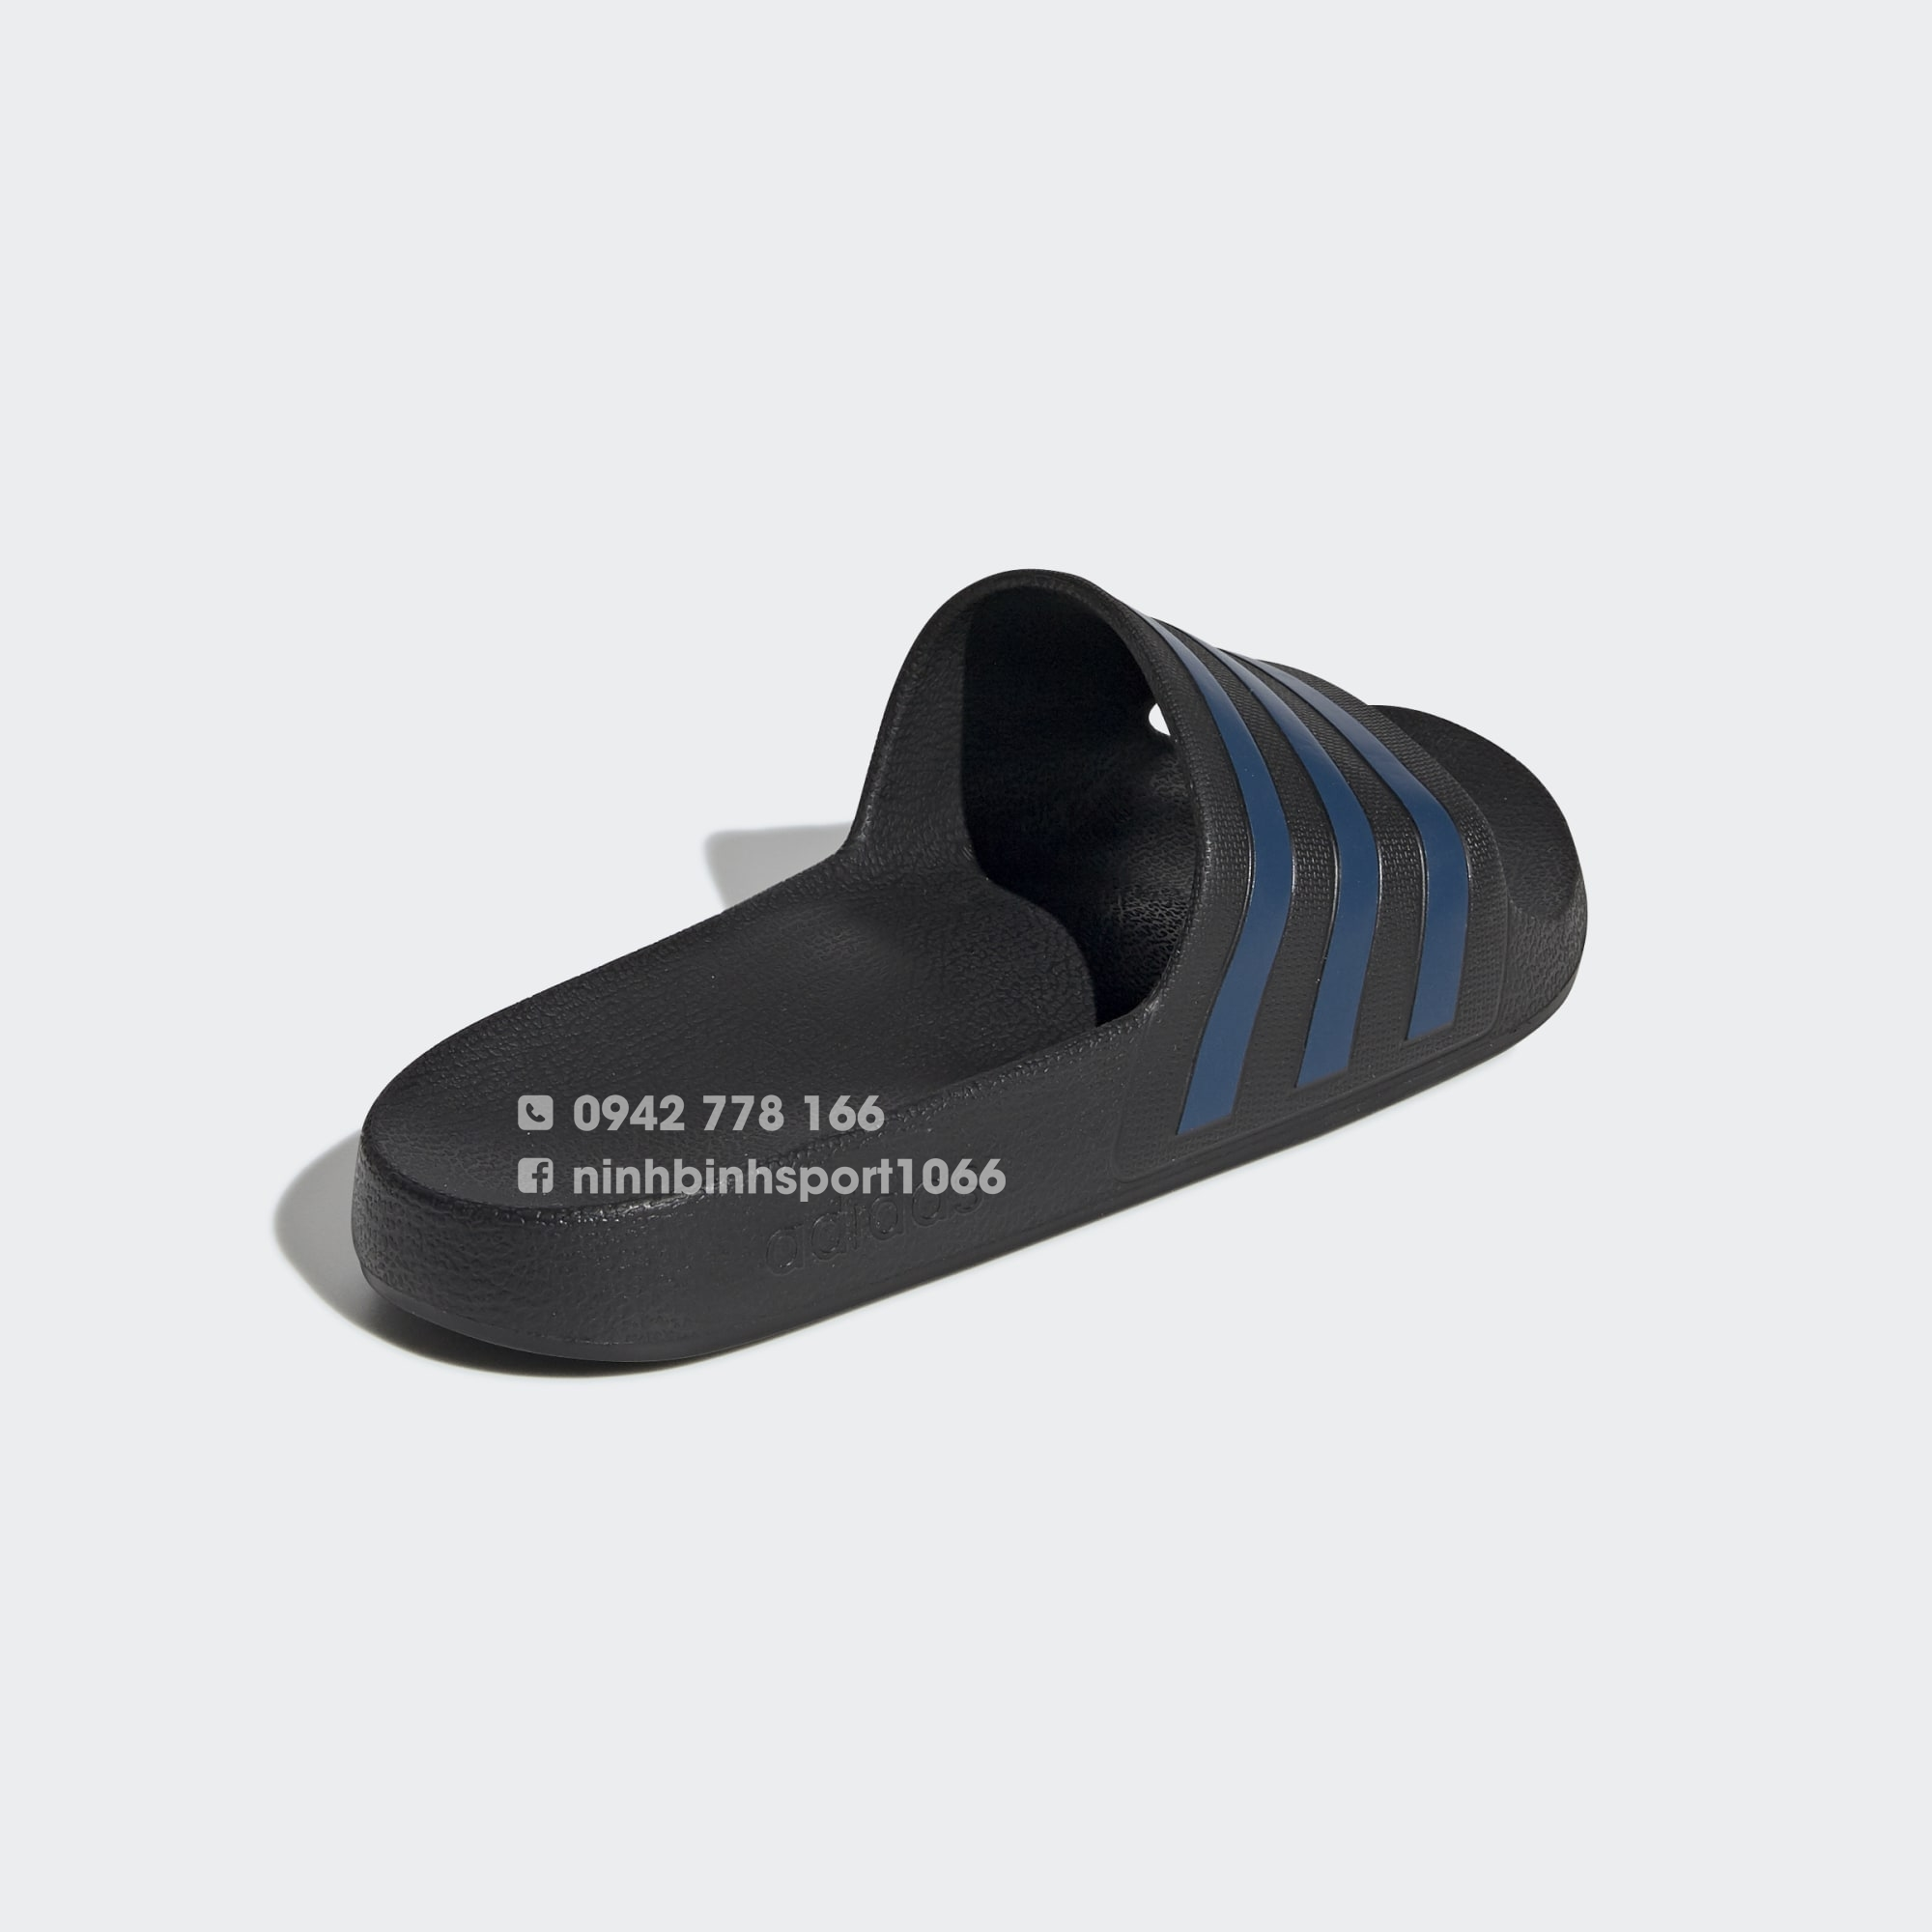 Dép thể thao nam Adidas Adilette Aqua F35532